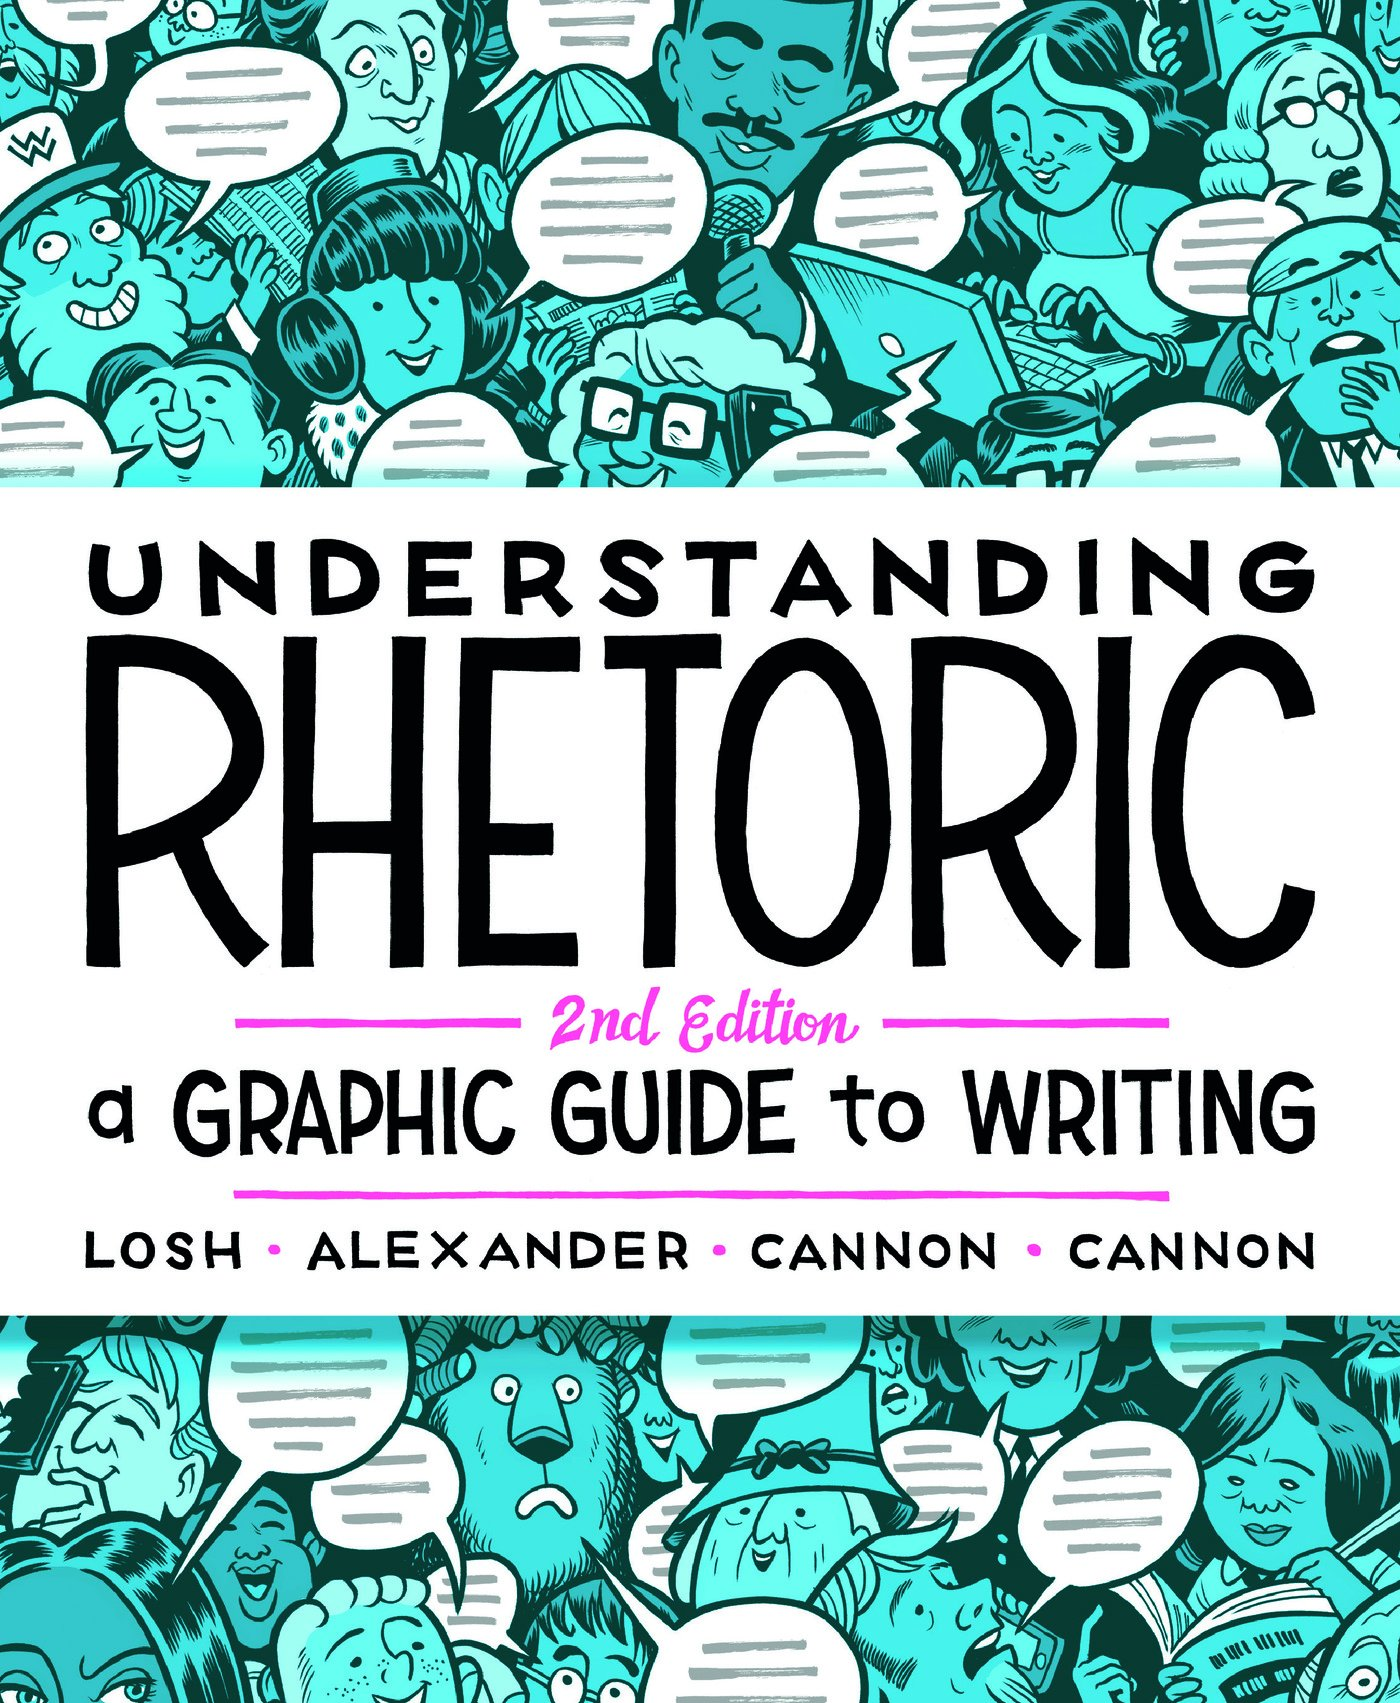 Understanding Rhetoric: A Graphic Guide to Writing: Elizabeth Losh,  Jonathan Alexander, Kevin Cannon, Zander Cannon: 9781319042134: Creative  Writing ...